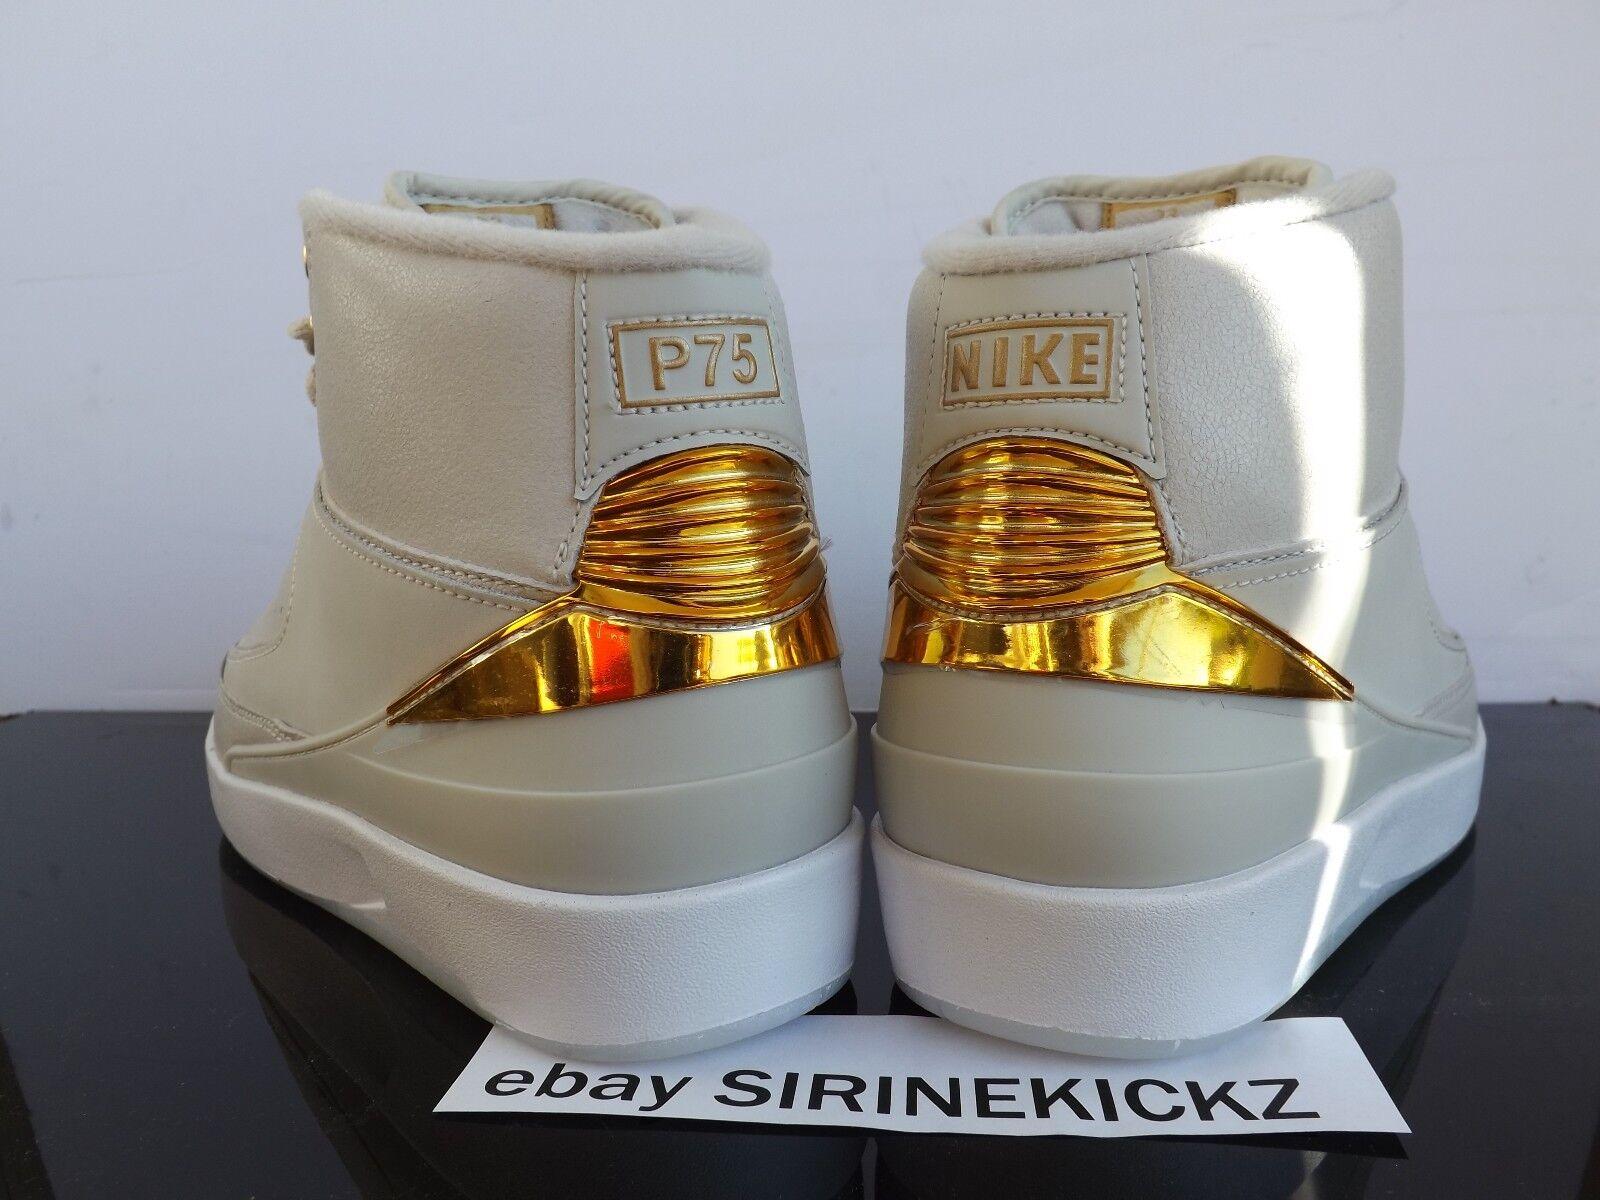 Nike air jordan 2 ii retro - quai 54 beige turnier gold tan 866035-001 pariser turnier beige e7f642